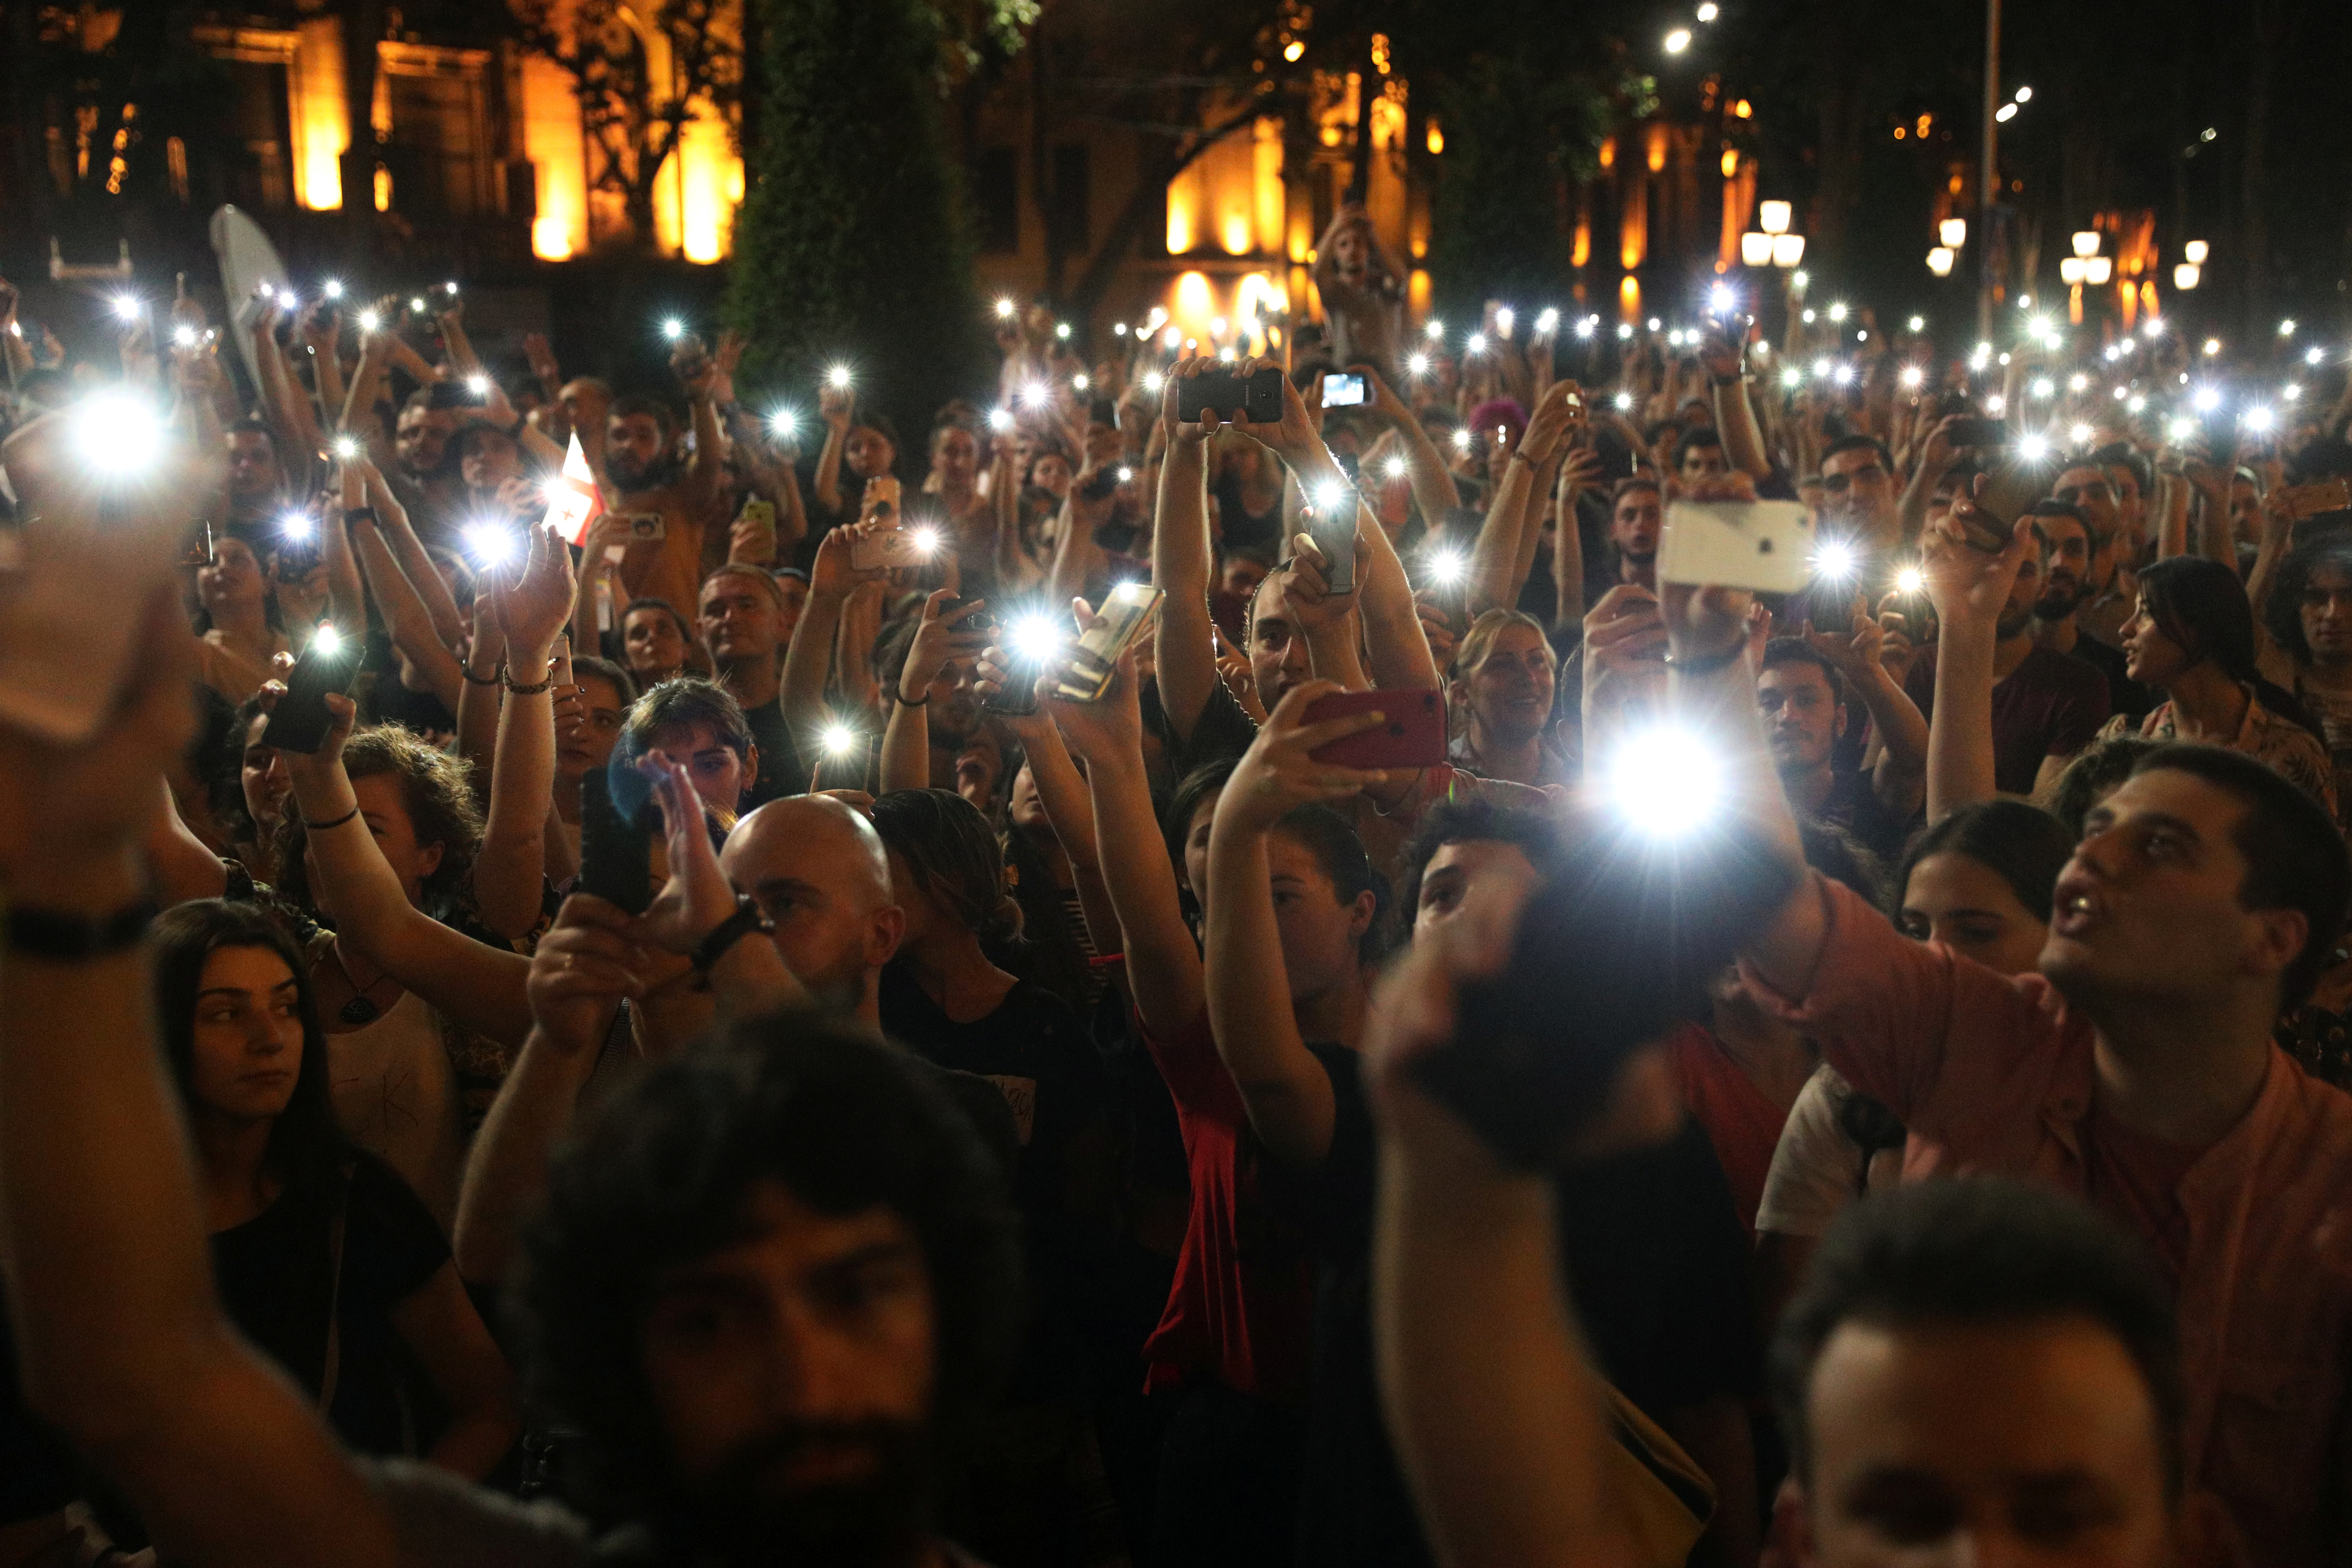 В Грузии арестовали более 120 протестующих   Korrespondent.net